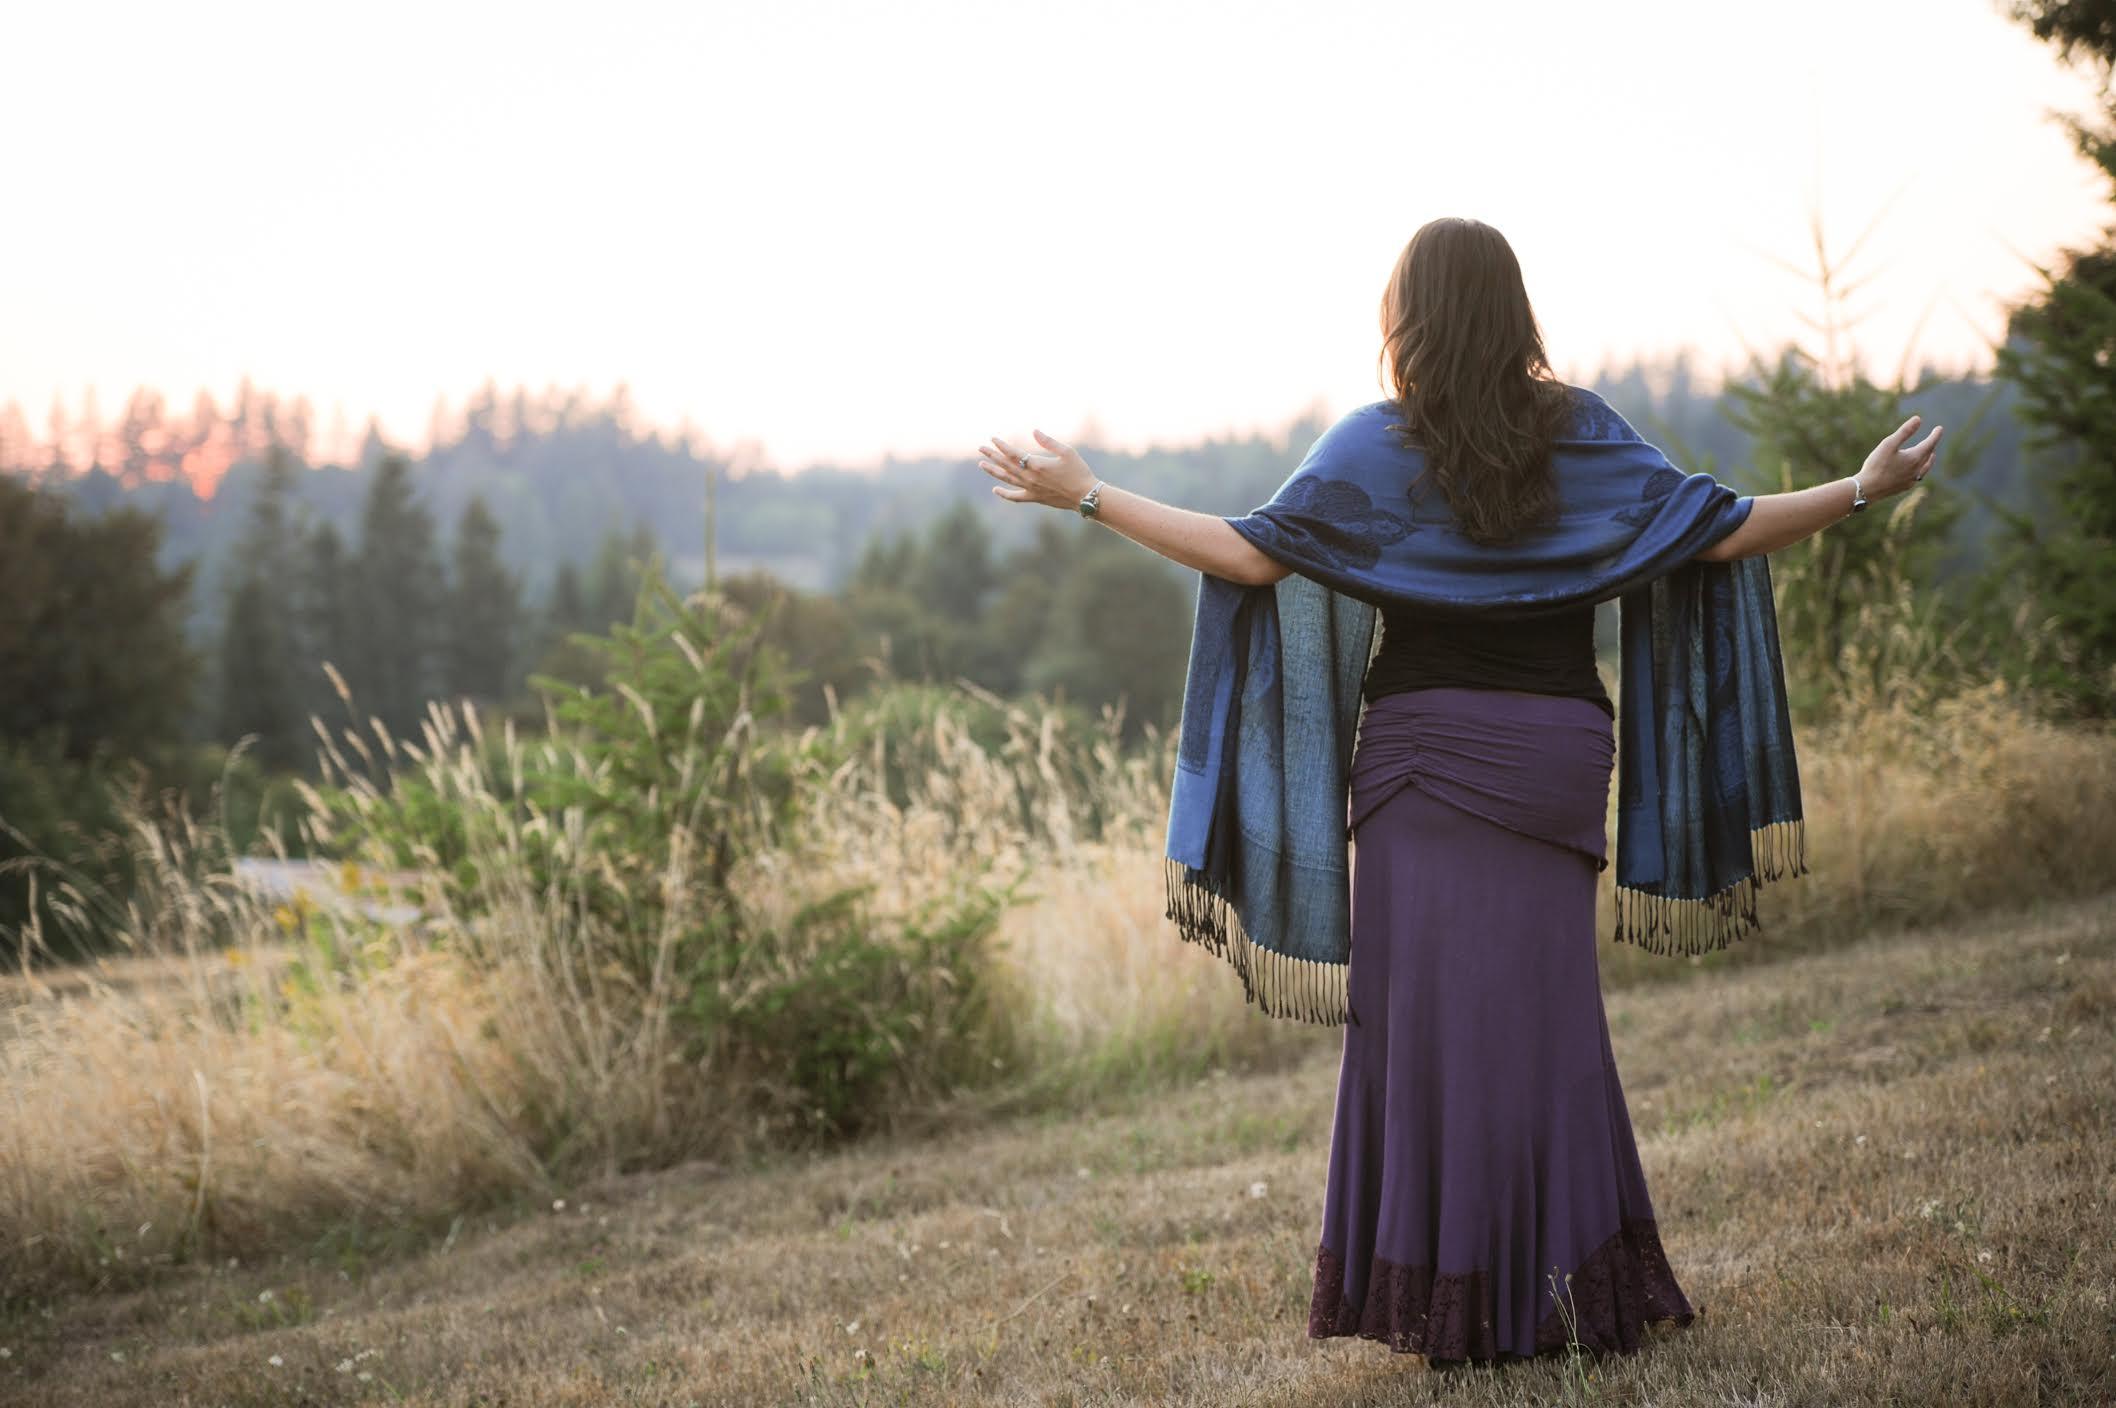 Shaman, Illumination Reiki Master Michelle Hawk offers Classes in Portland, OR